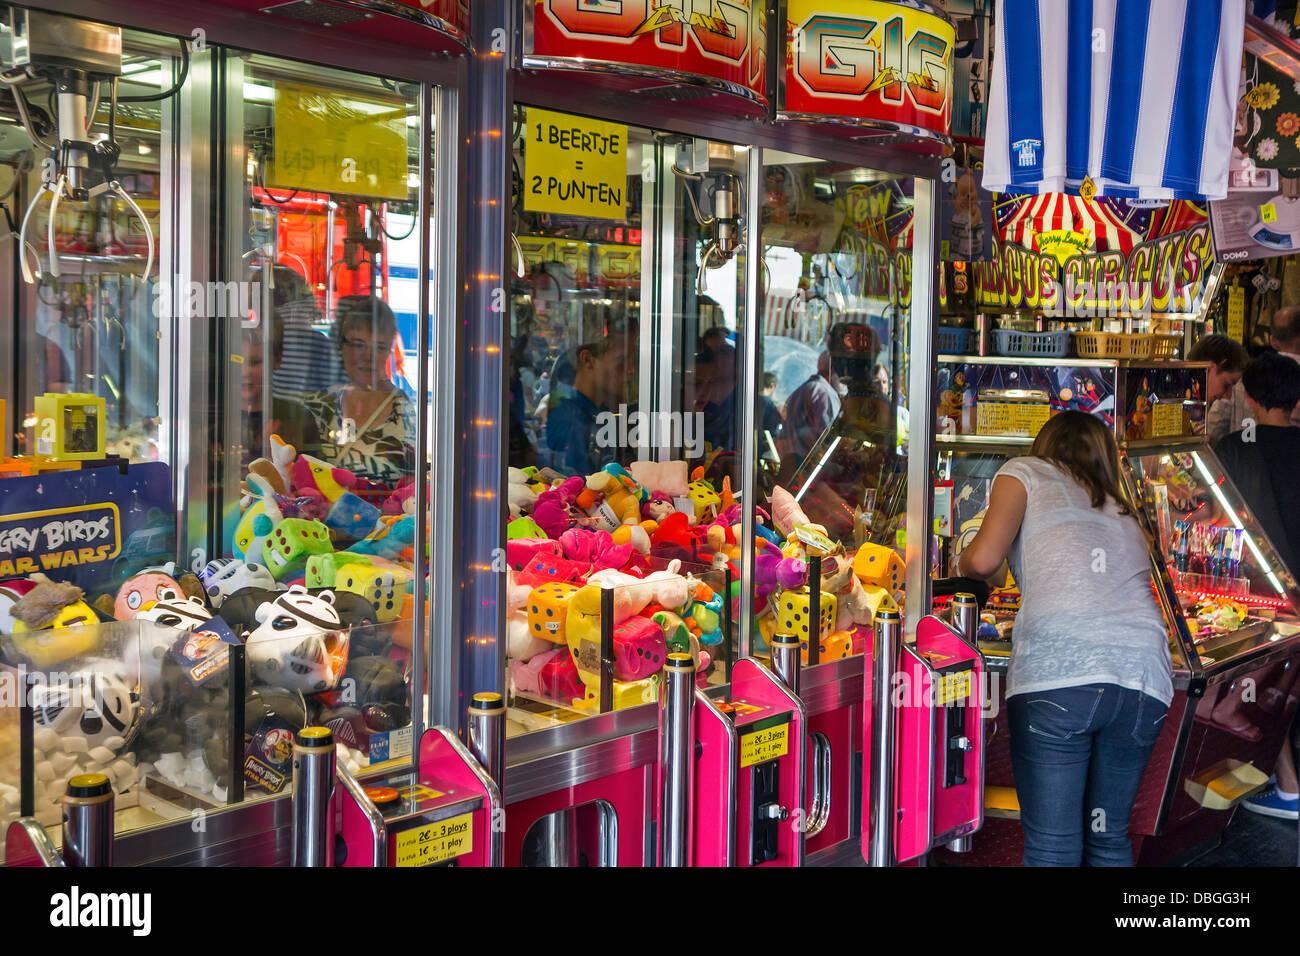 carnival claw machine